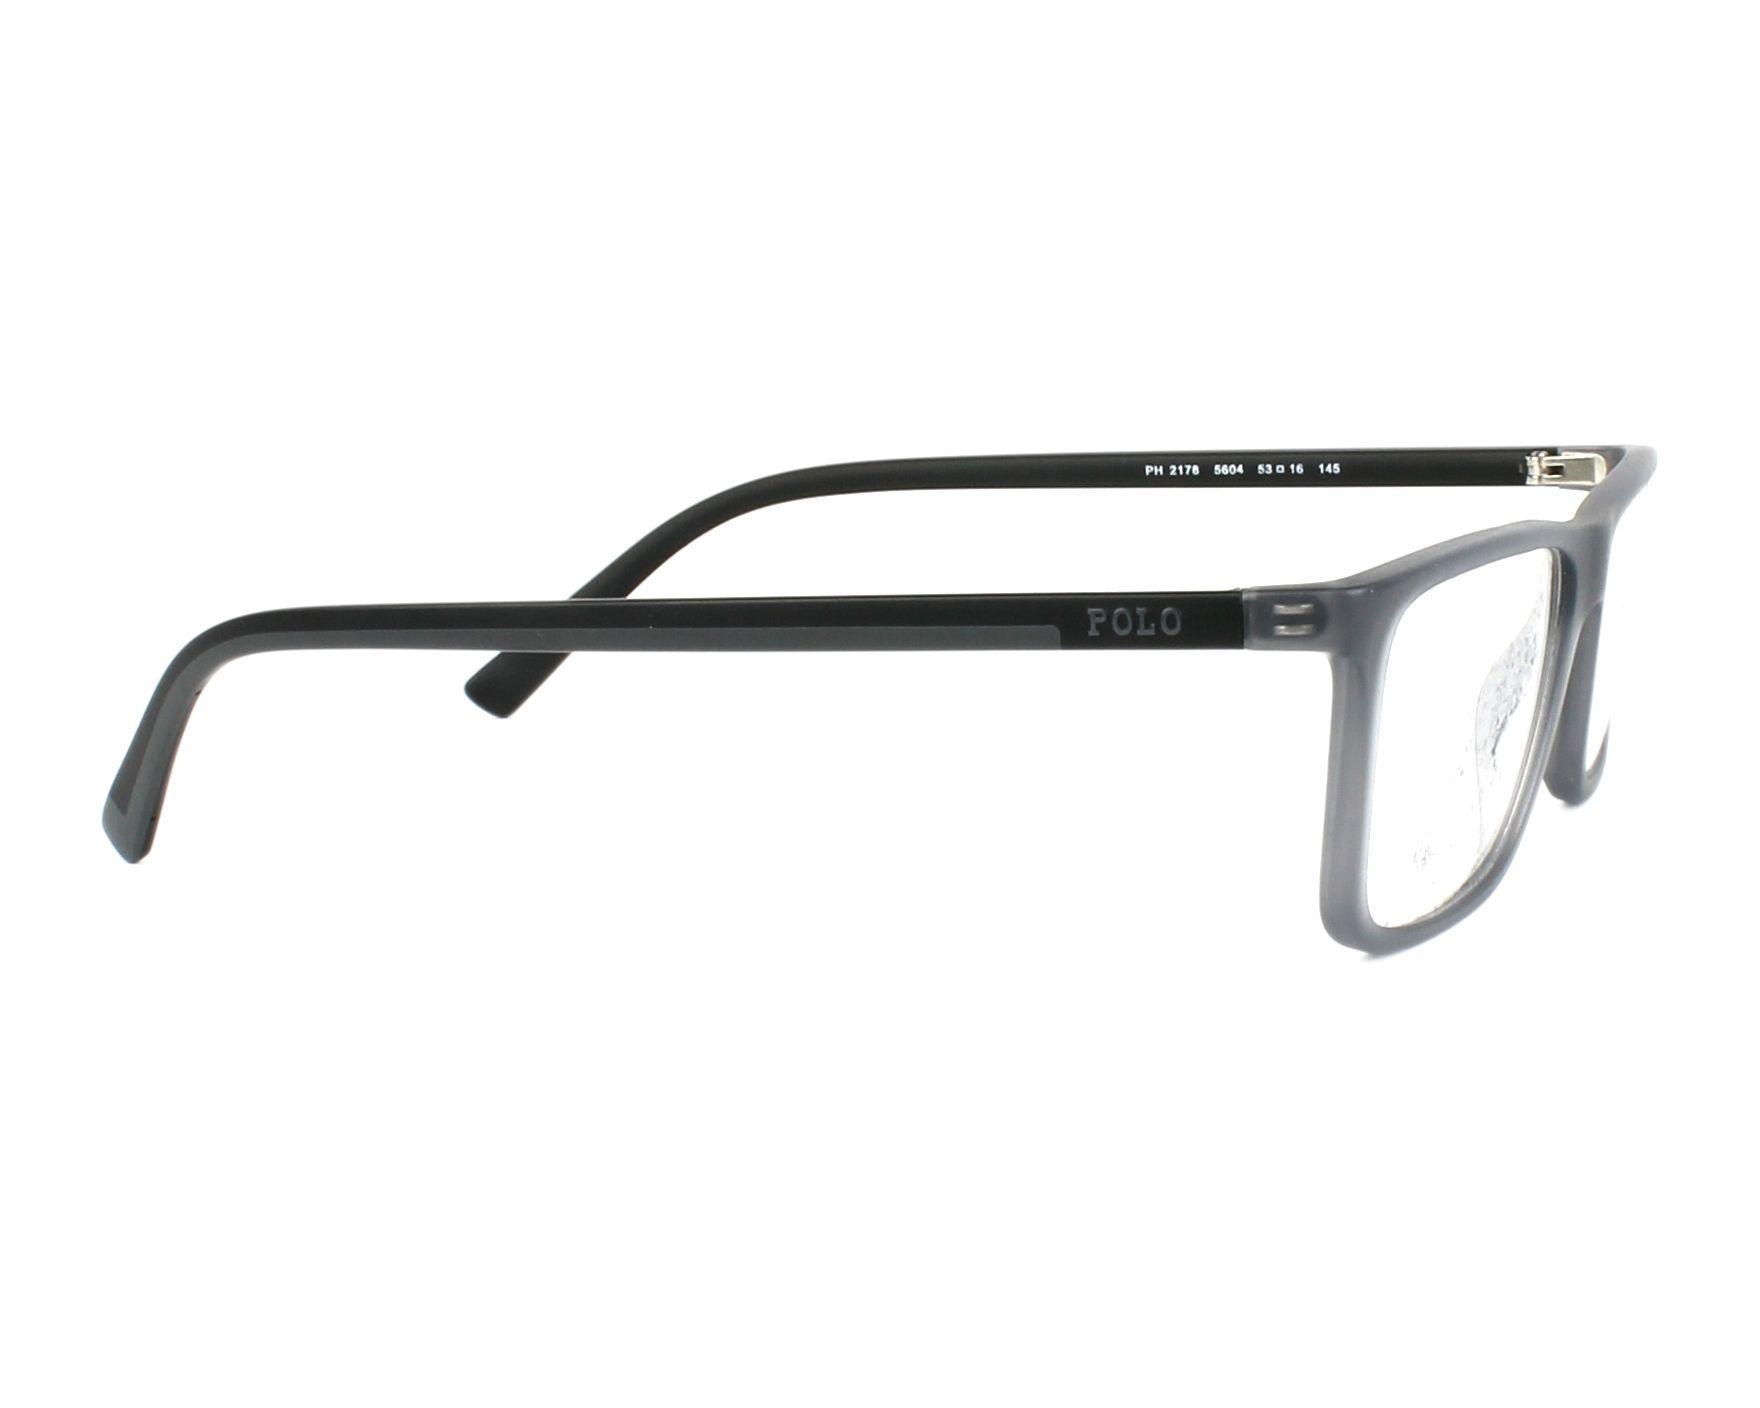 7970baf1ae9 eyeglasses Polo Ralph Lauren PH-2178 5604 53-16 Grey side view